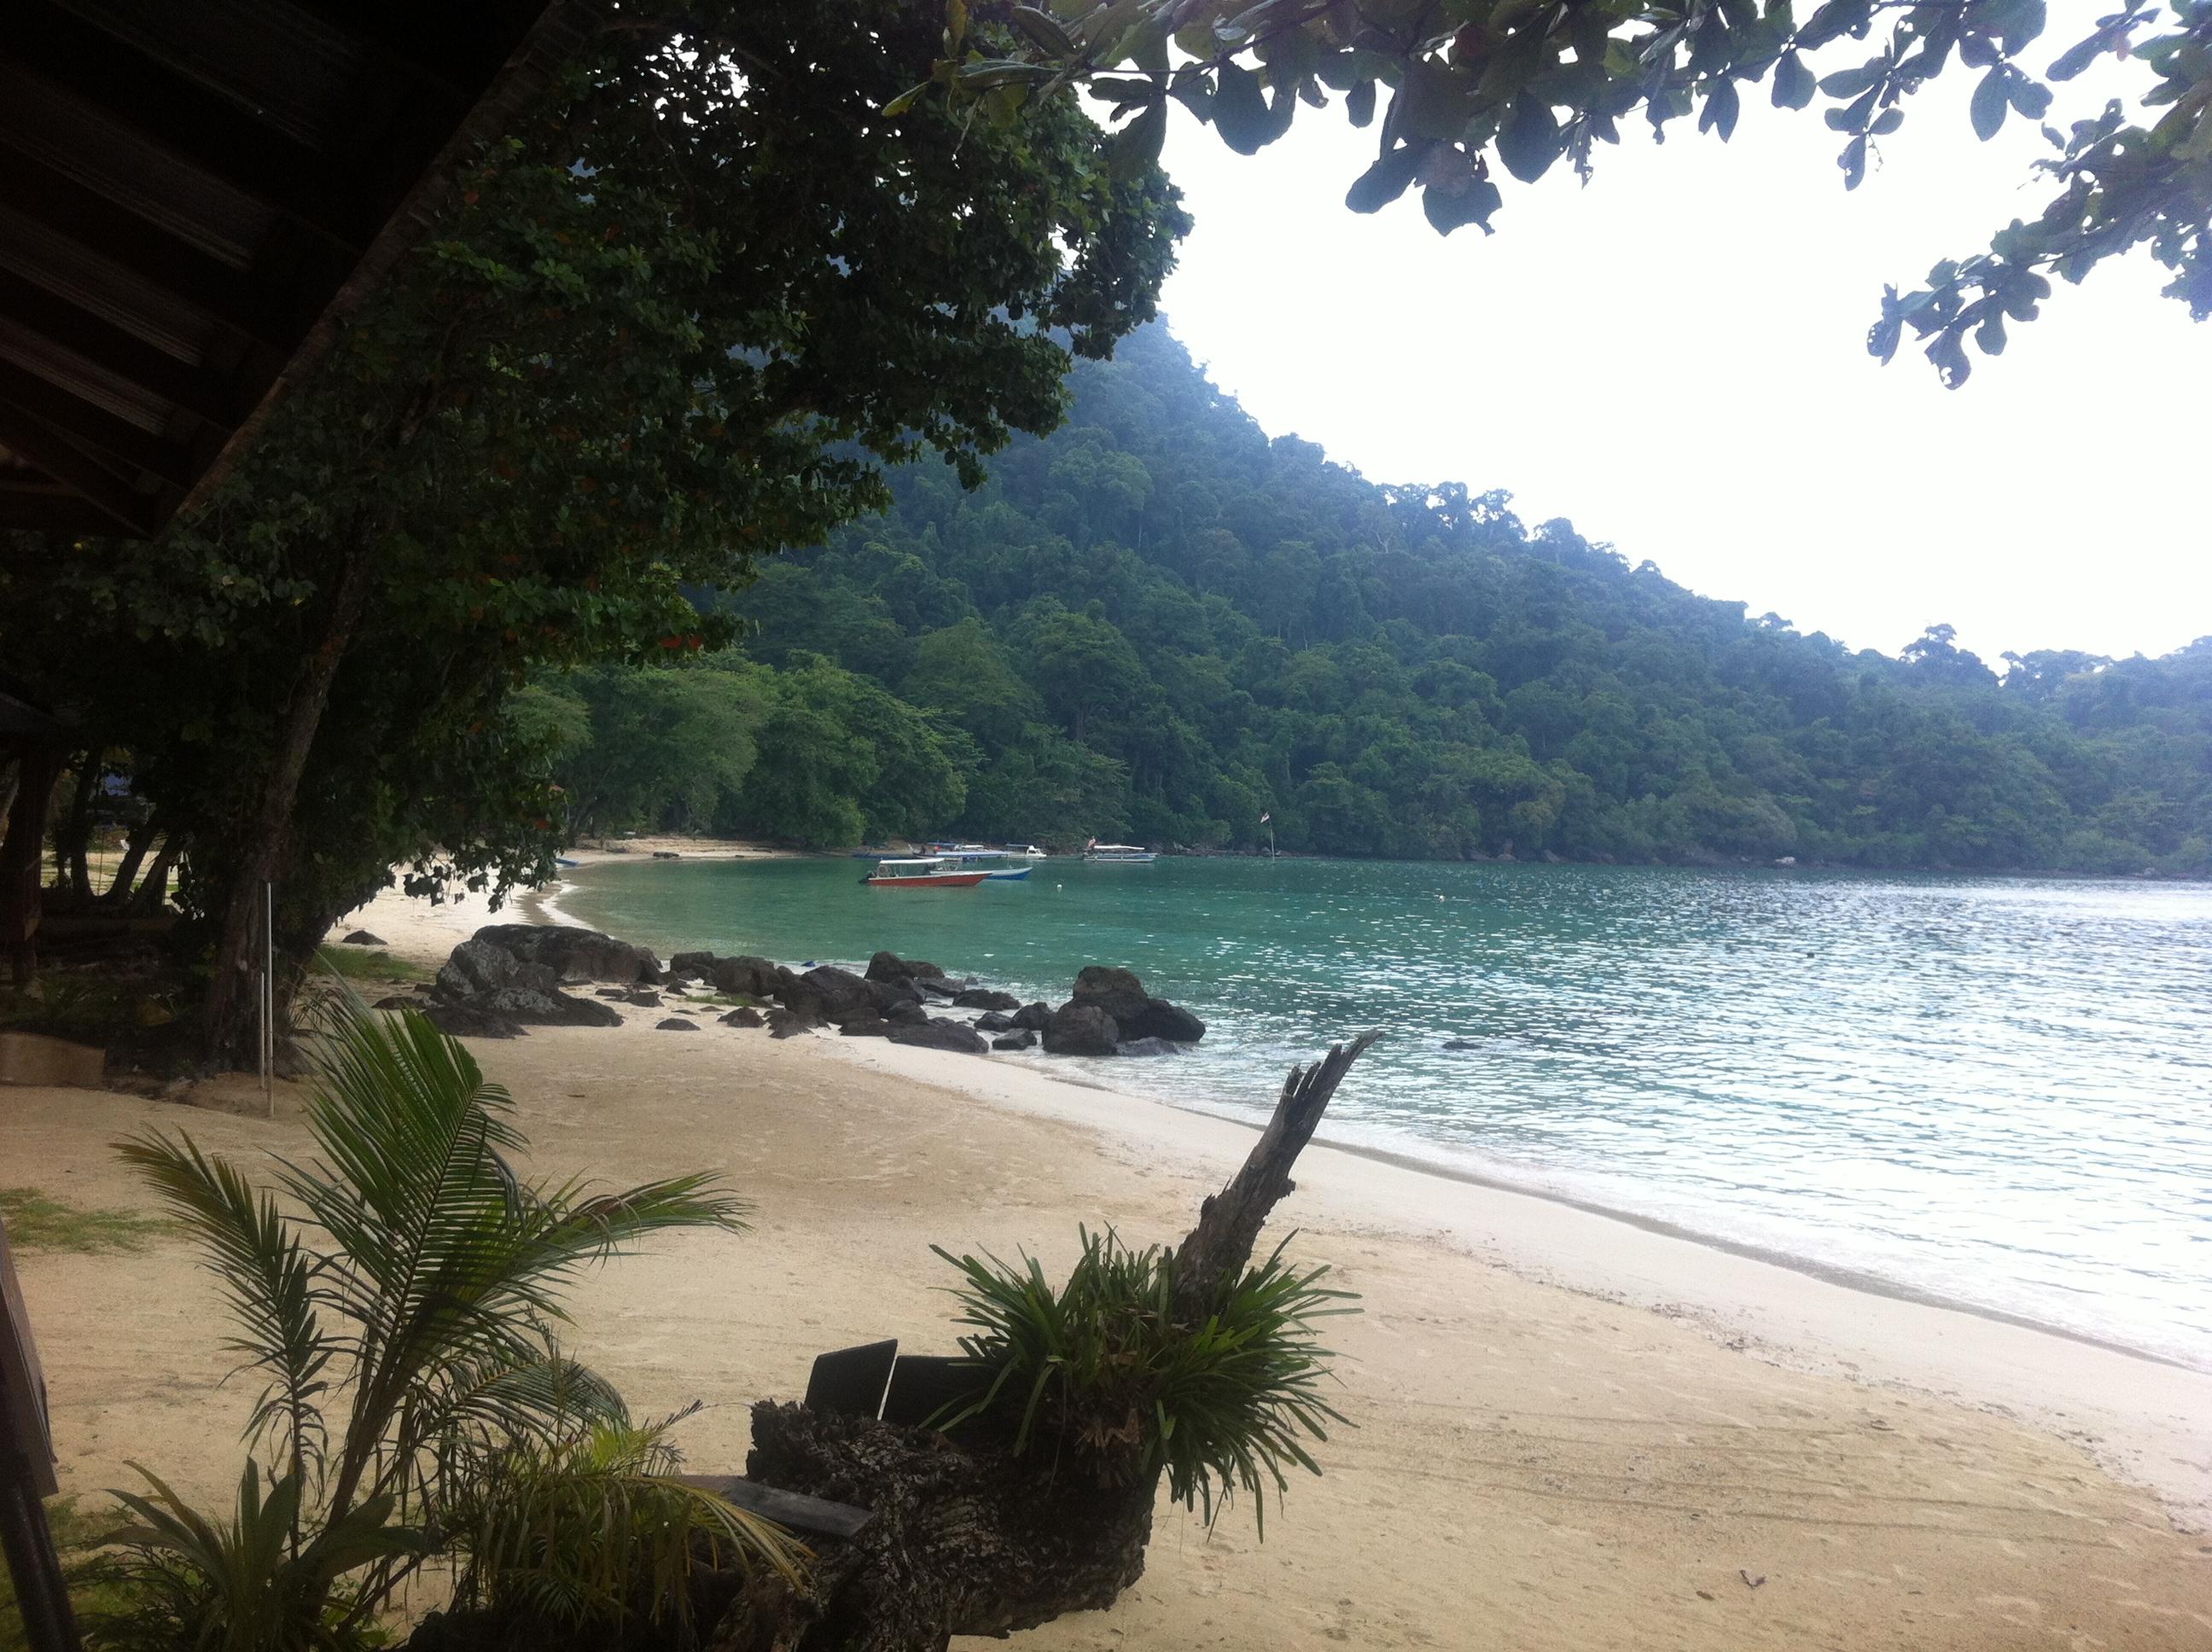 Tenngol Island, Tanjong Jara